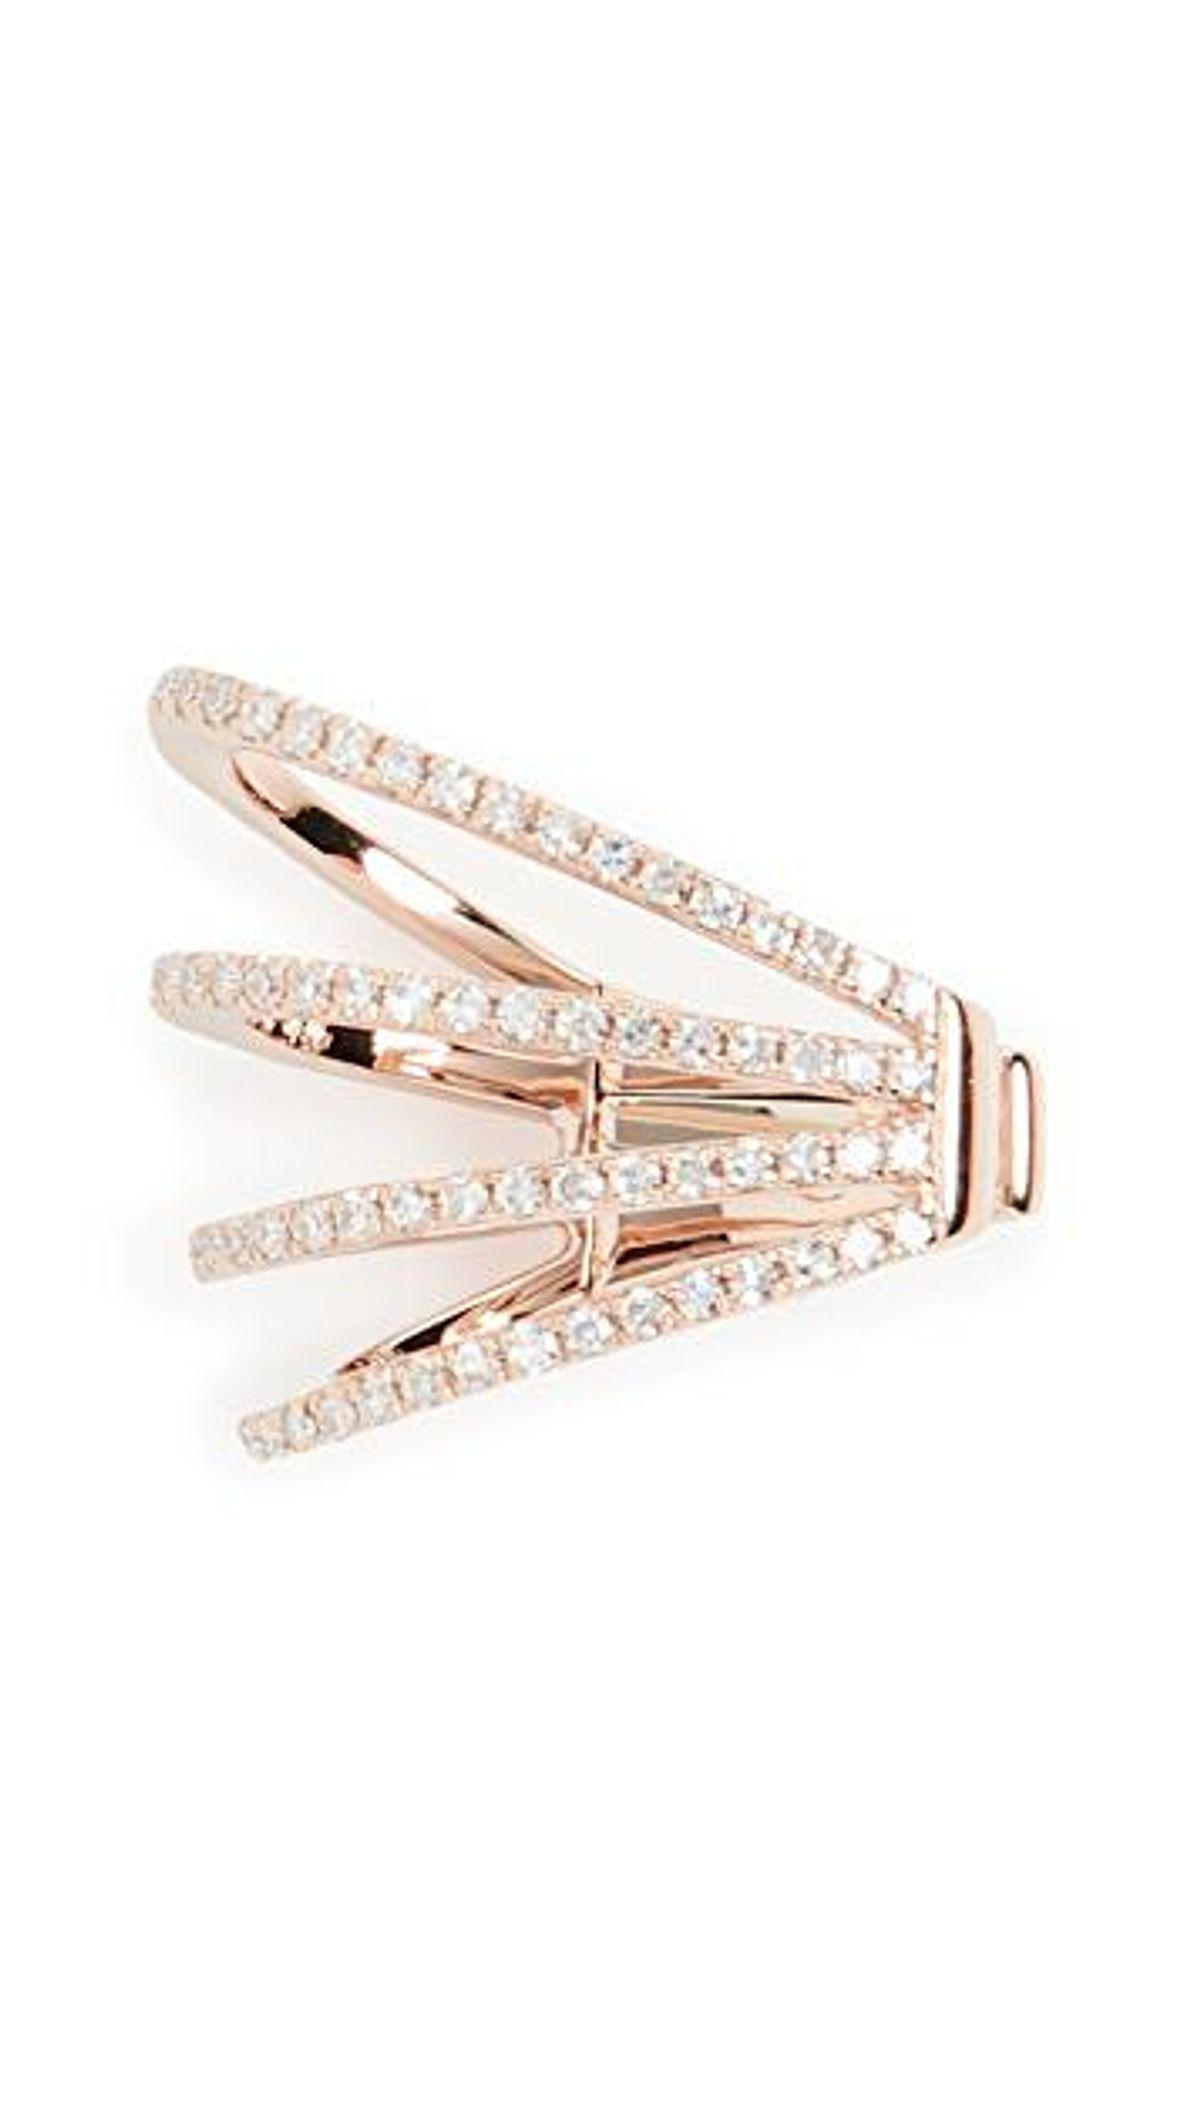 ef collection 14k diamond cage no piercing ear cuff